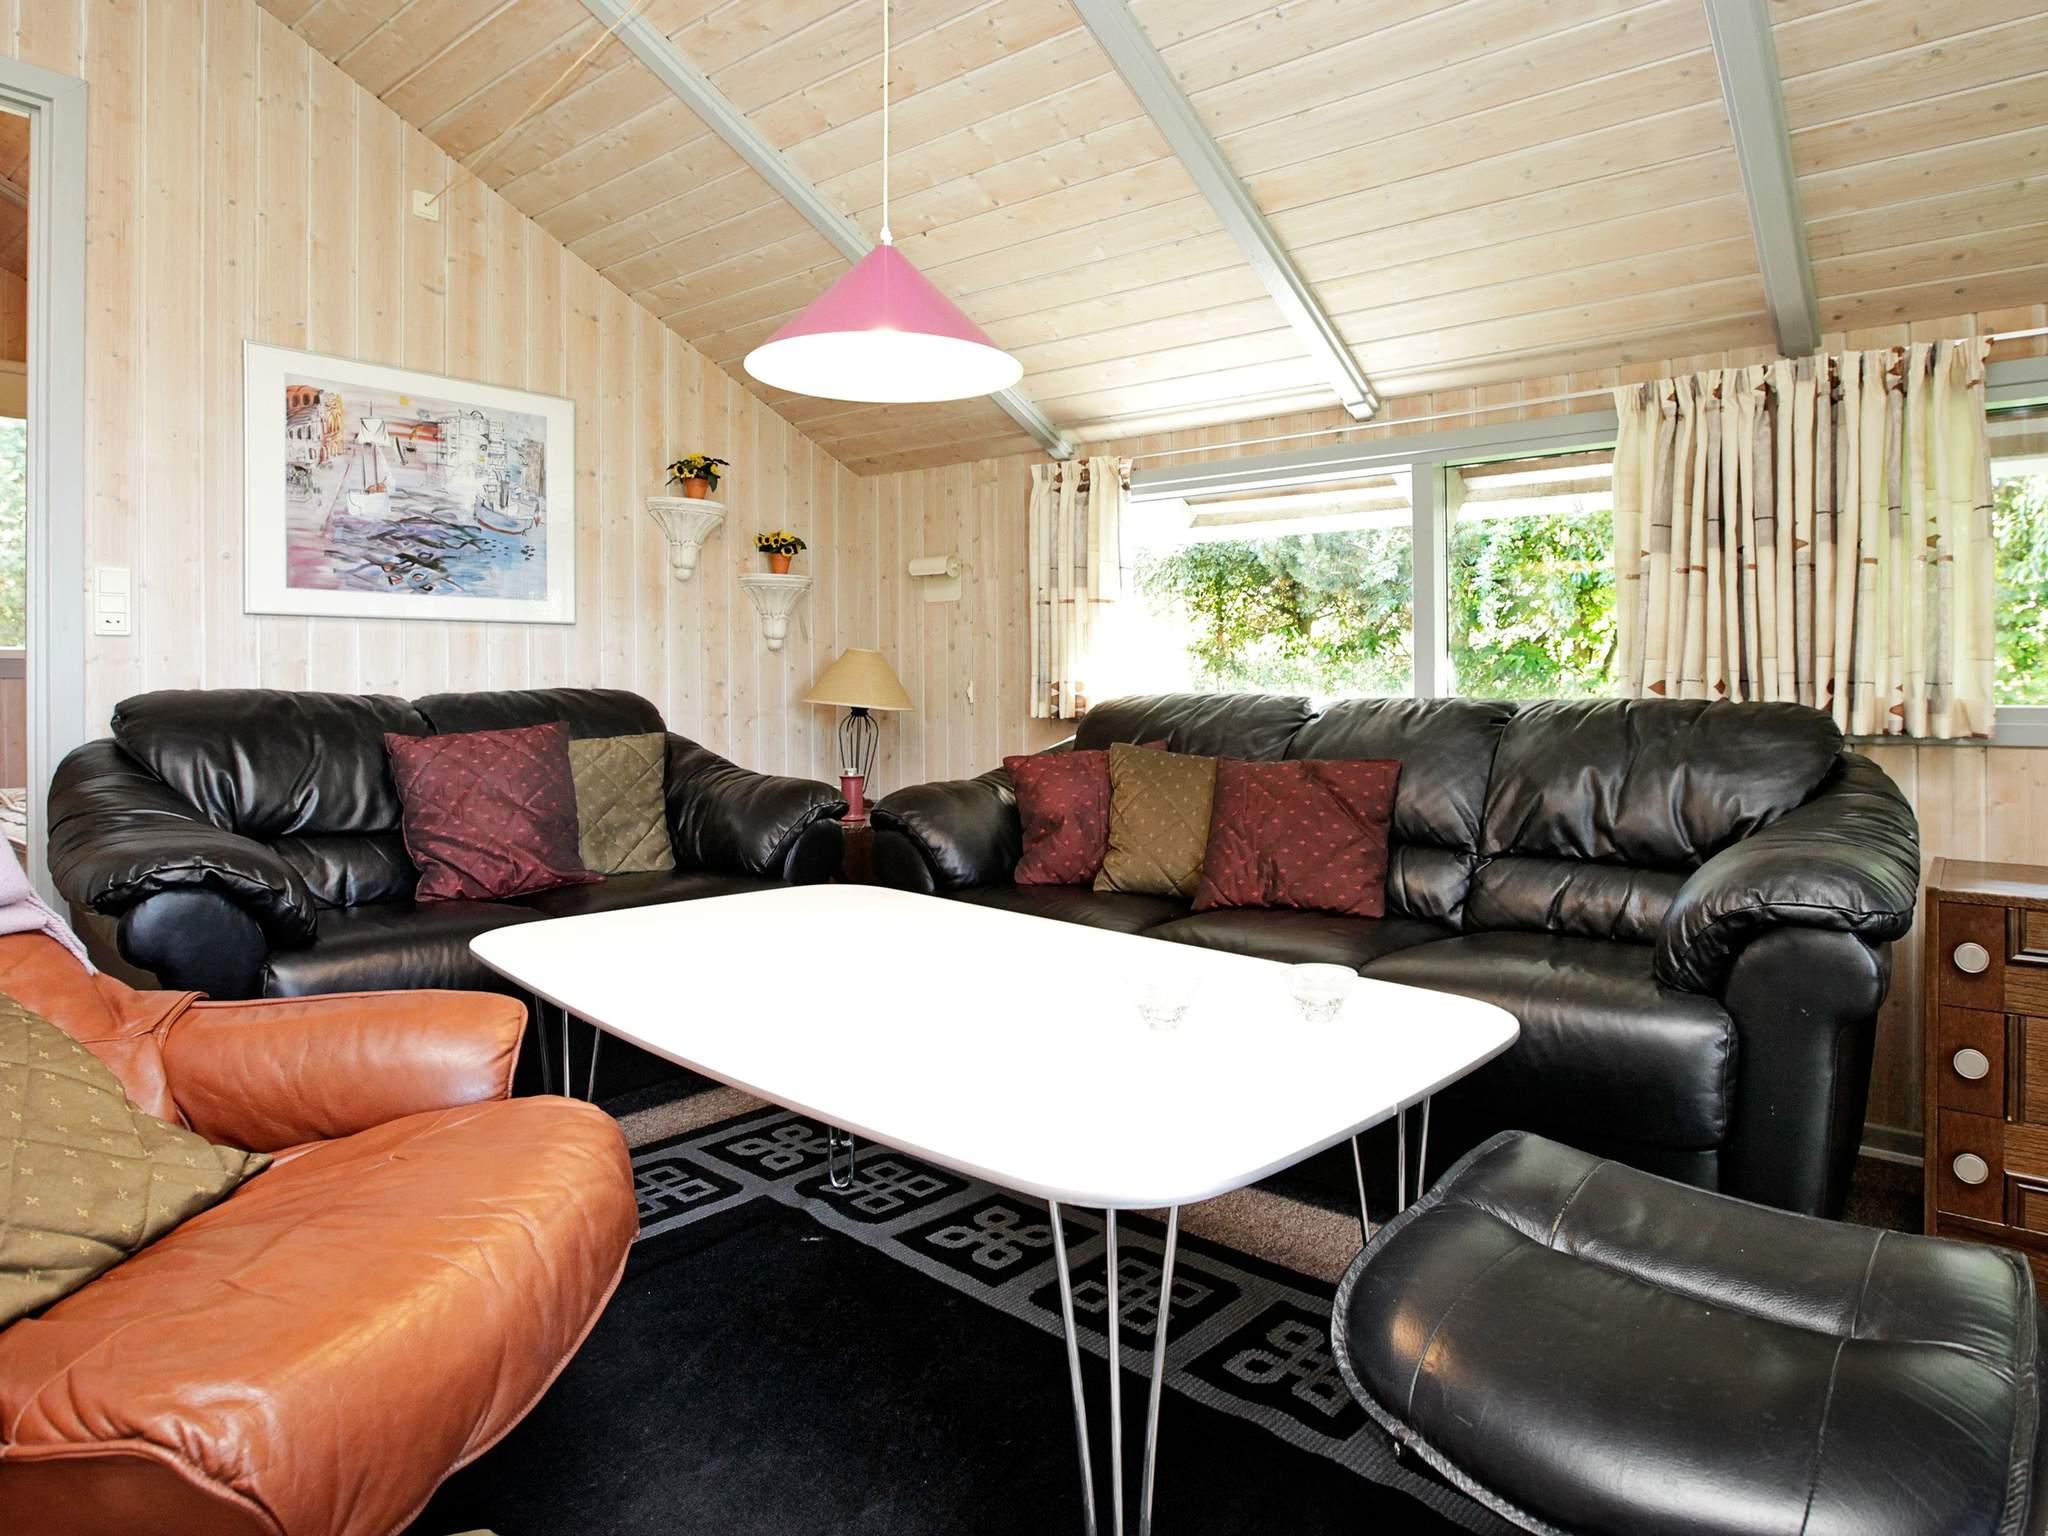 Ferienhaus Ristinge (93203), Ristinge, , Langeland, Dänemark, Bild 14